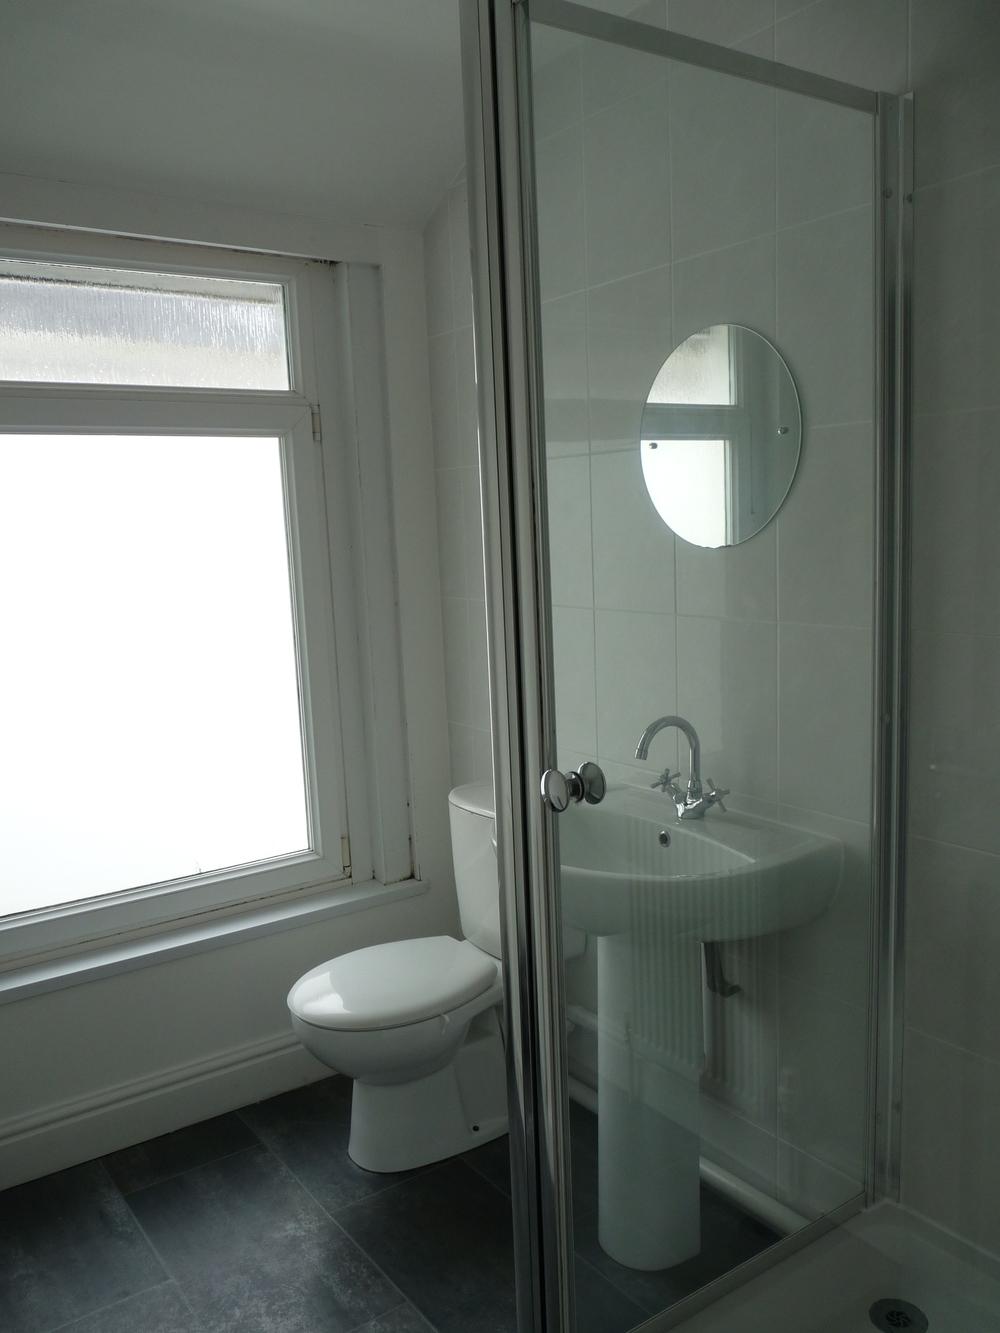 181 Bathroom 1.JPG